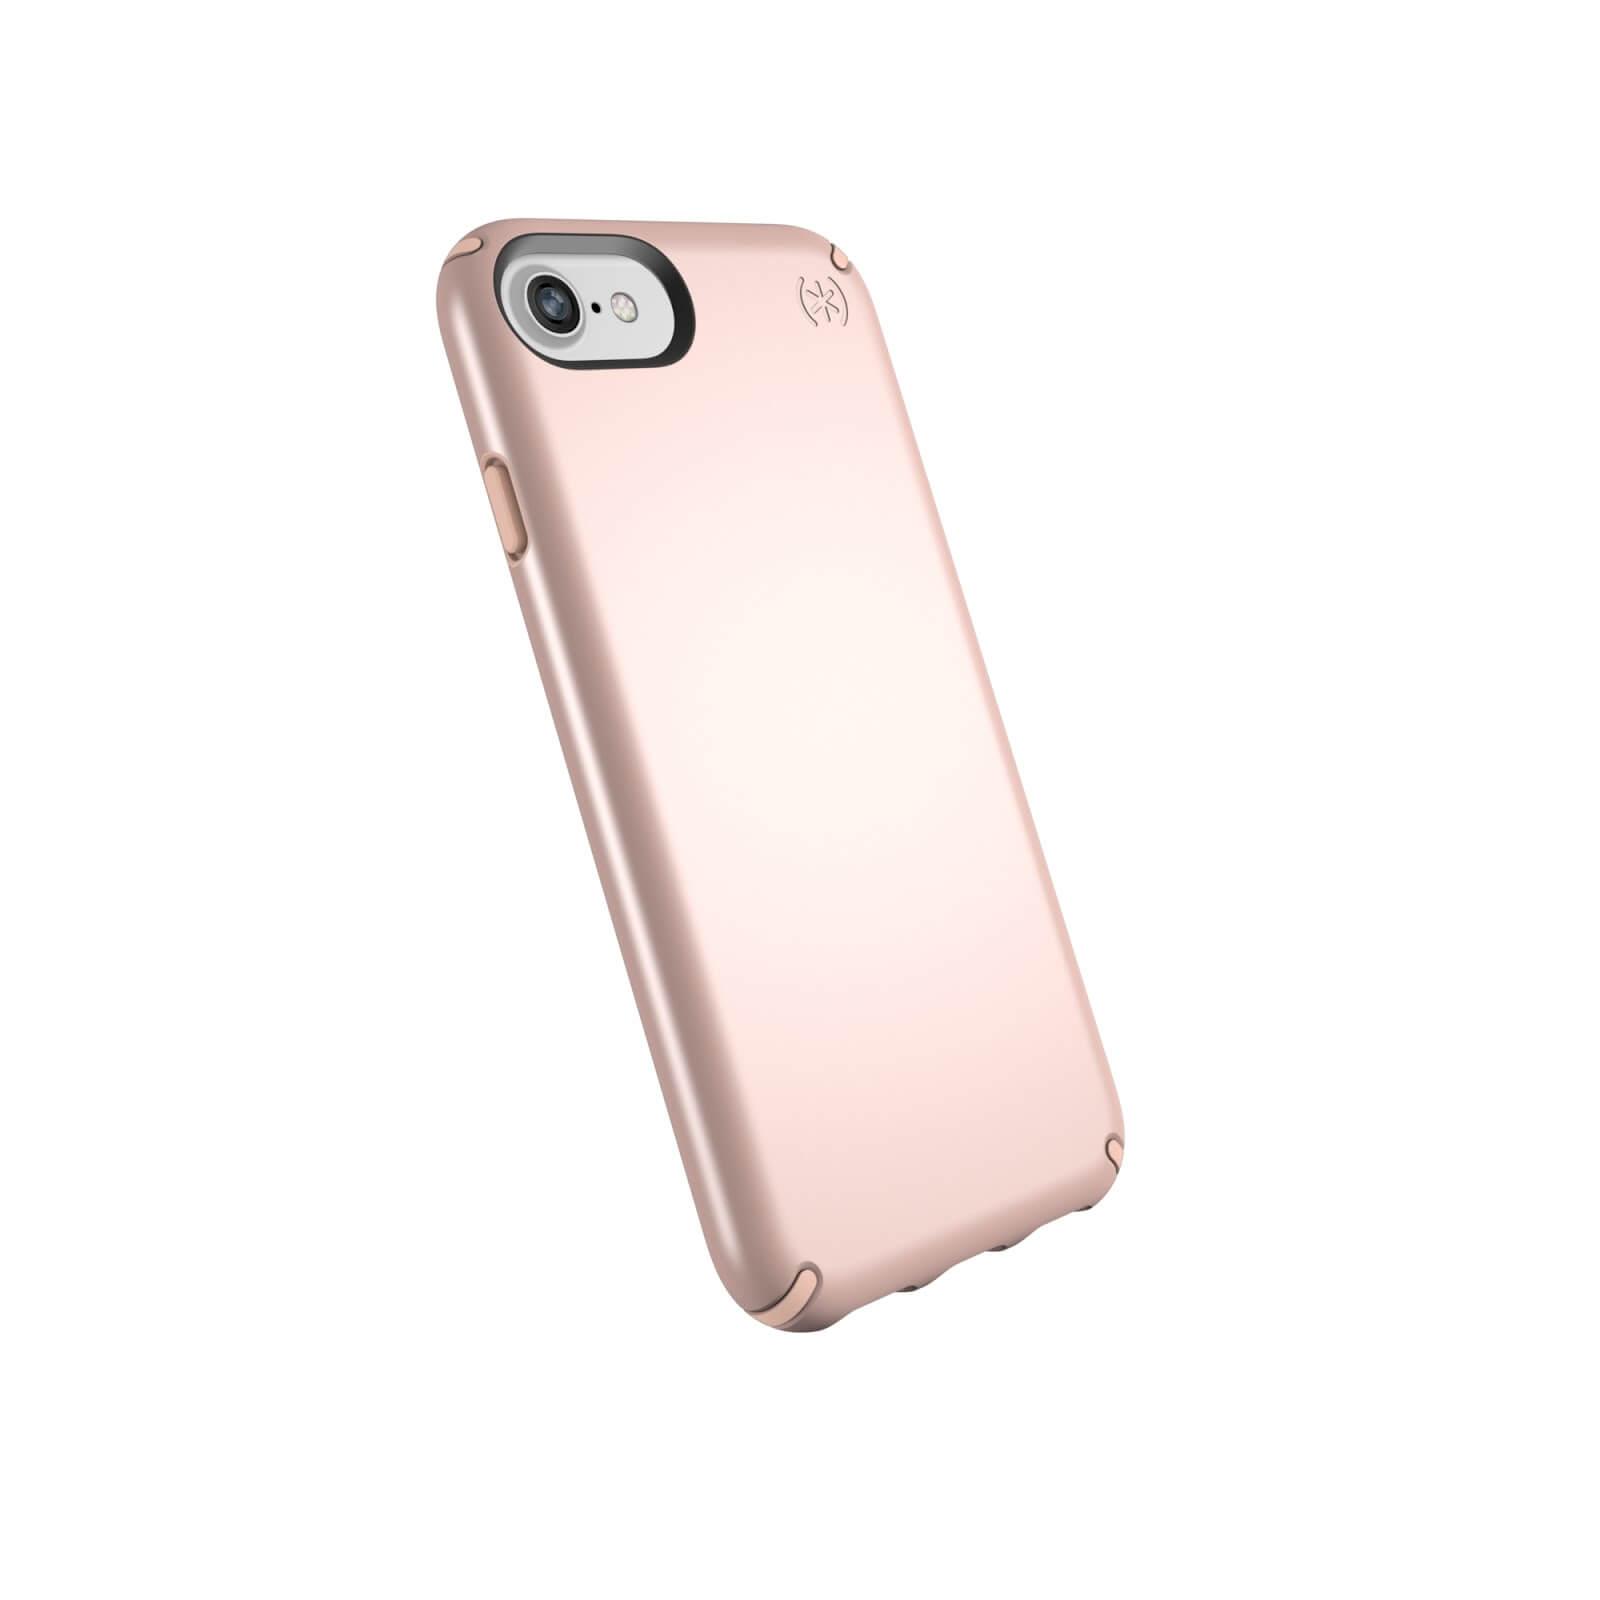 Speck iPhone case